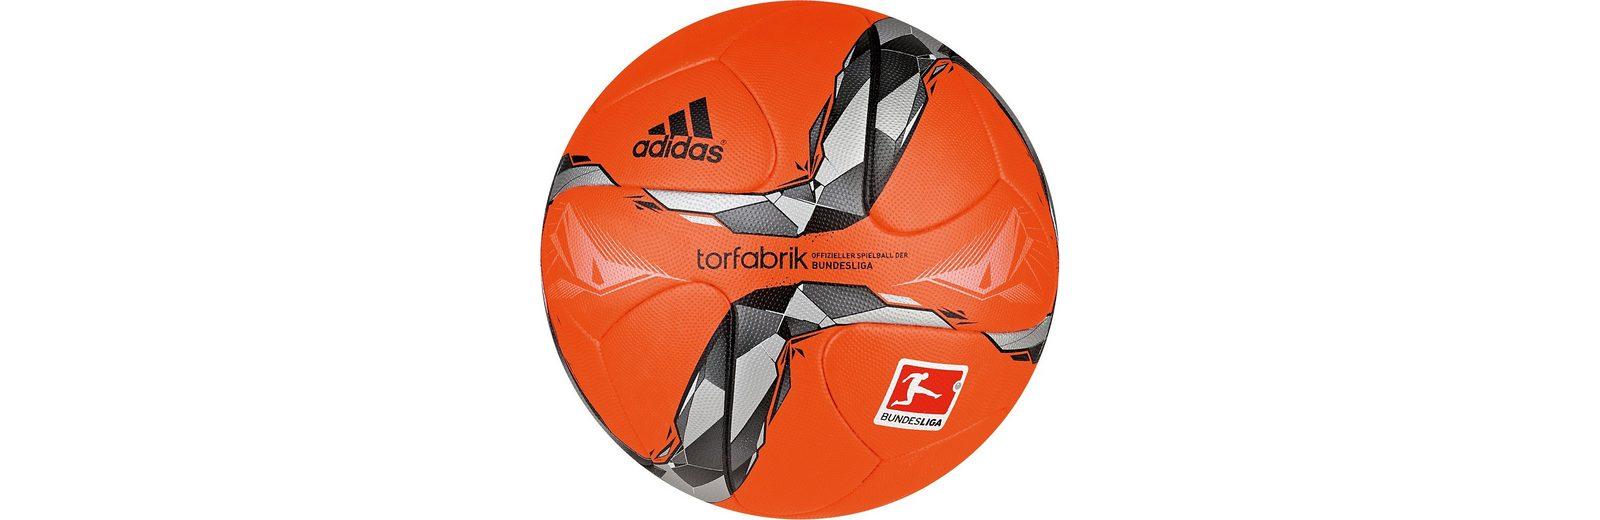 adidas Performance DFL Torfabrik 2015 Winter Matchball